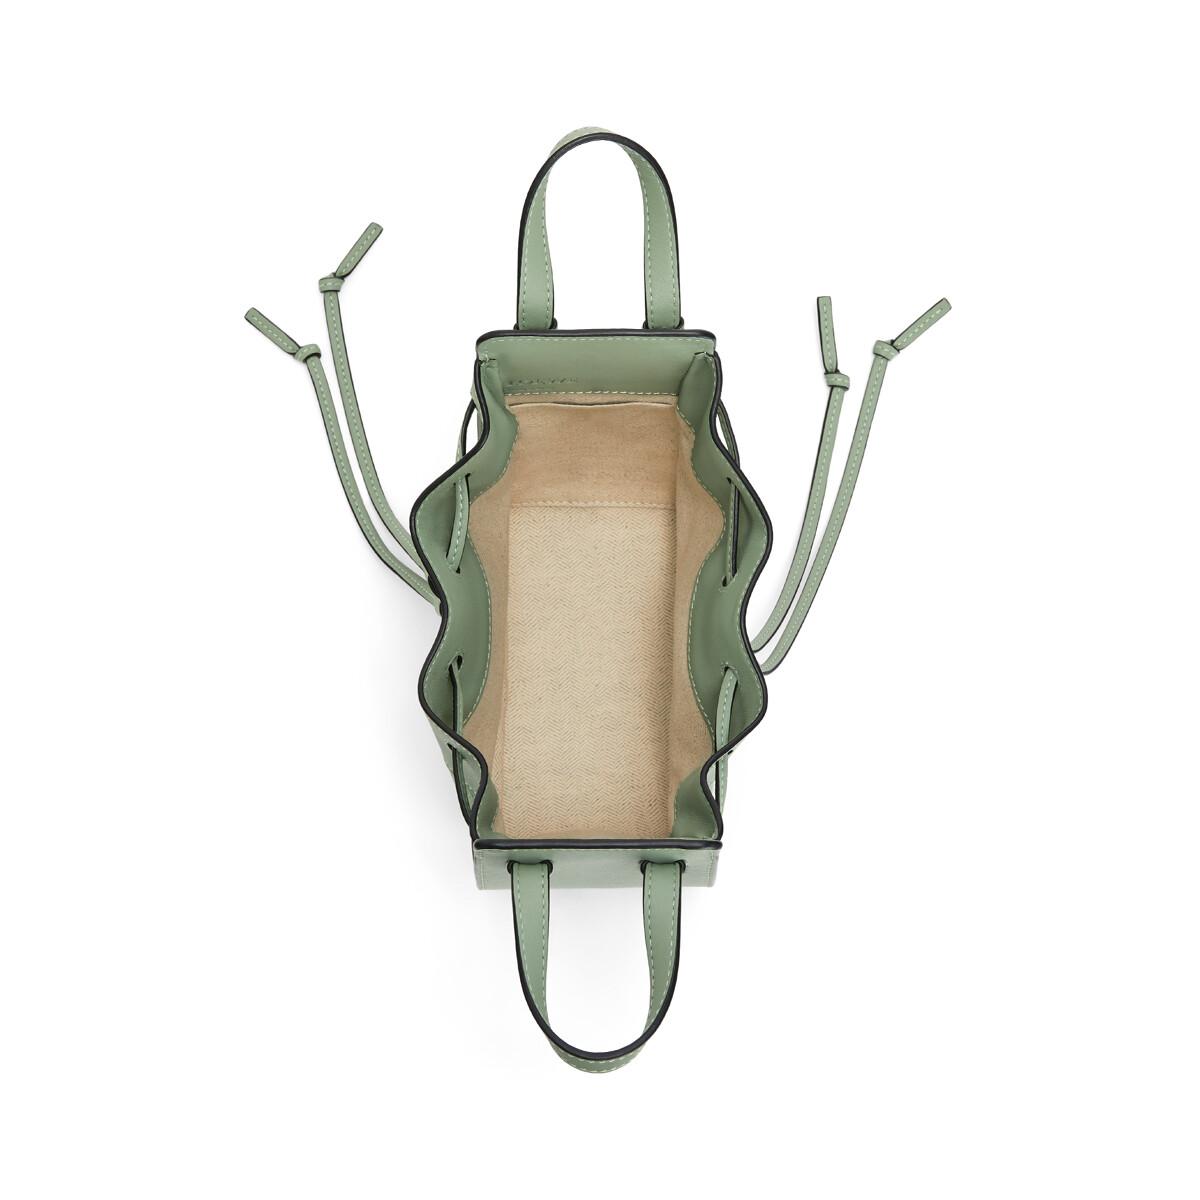 LOEWE Hammock Drawstring Small Bag Pale Green front